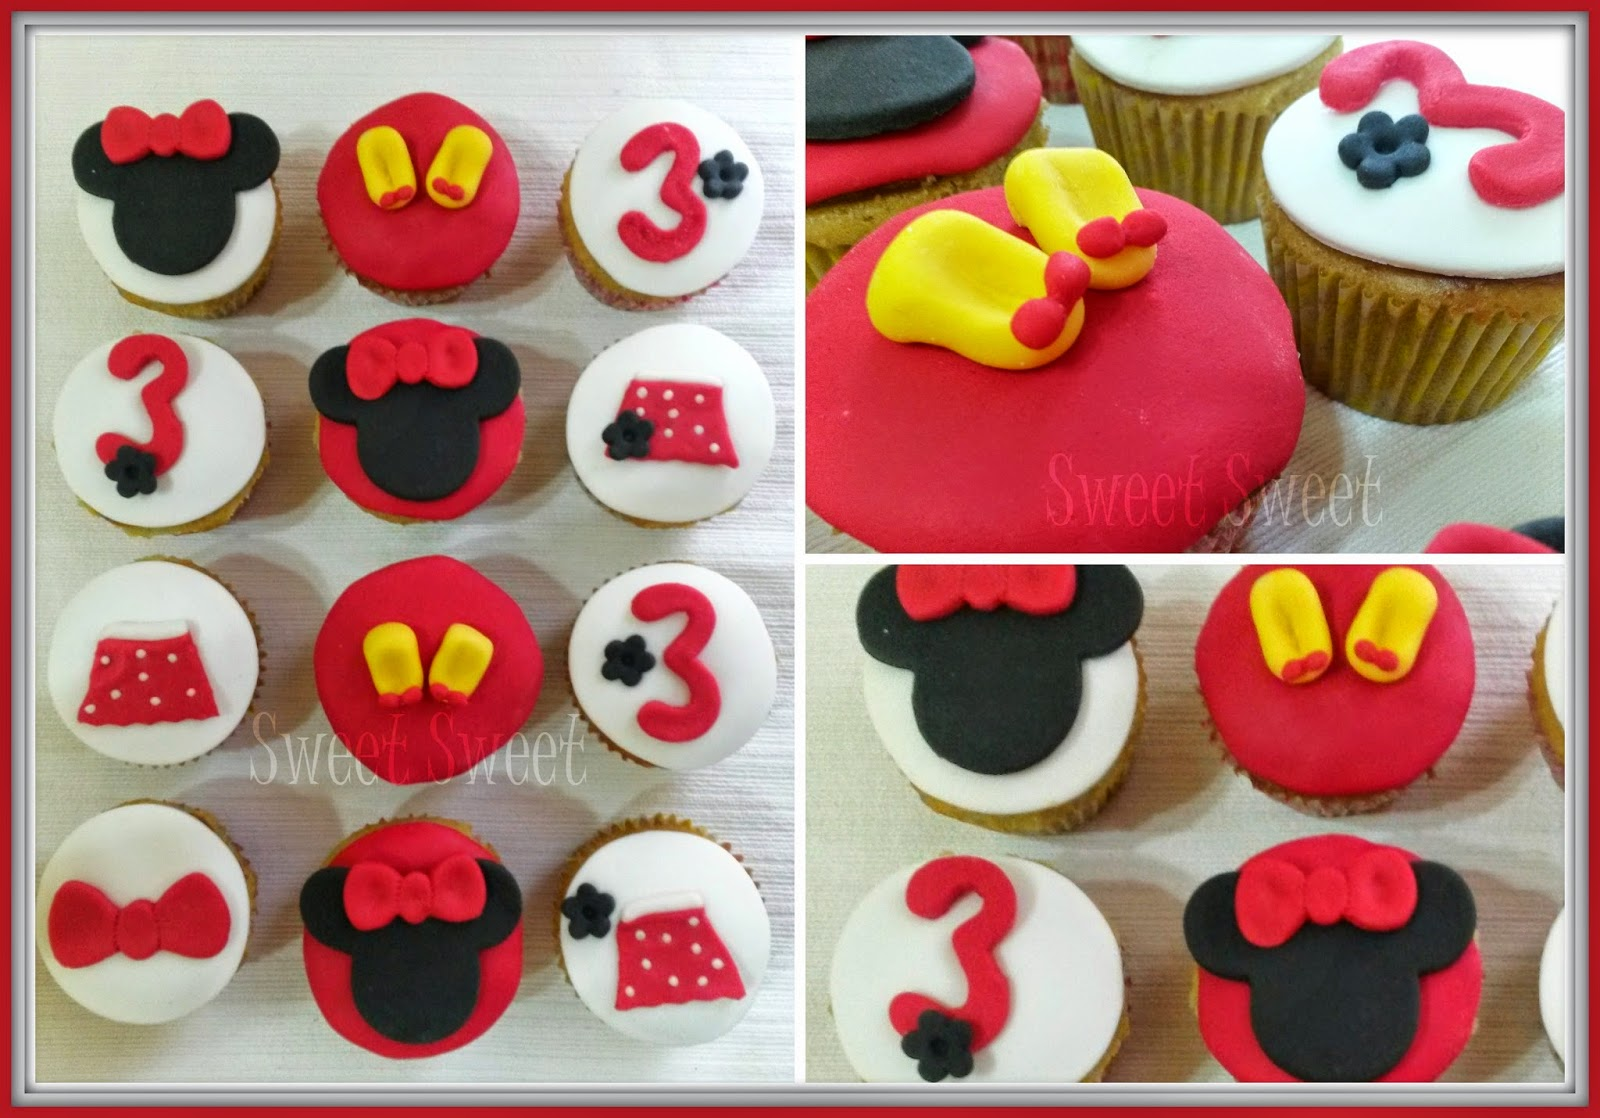 Sweet Sweet Pasteleria Tortas Decoradas Cupcakes Minnie Mouse